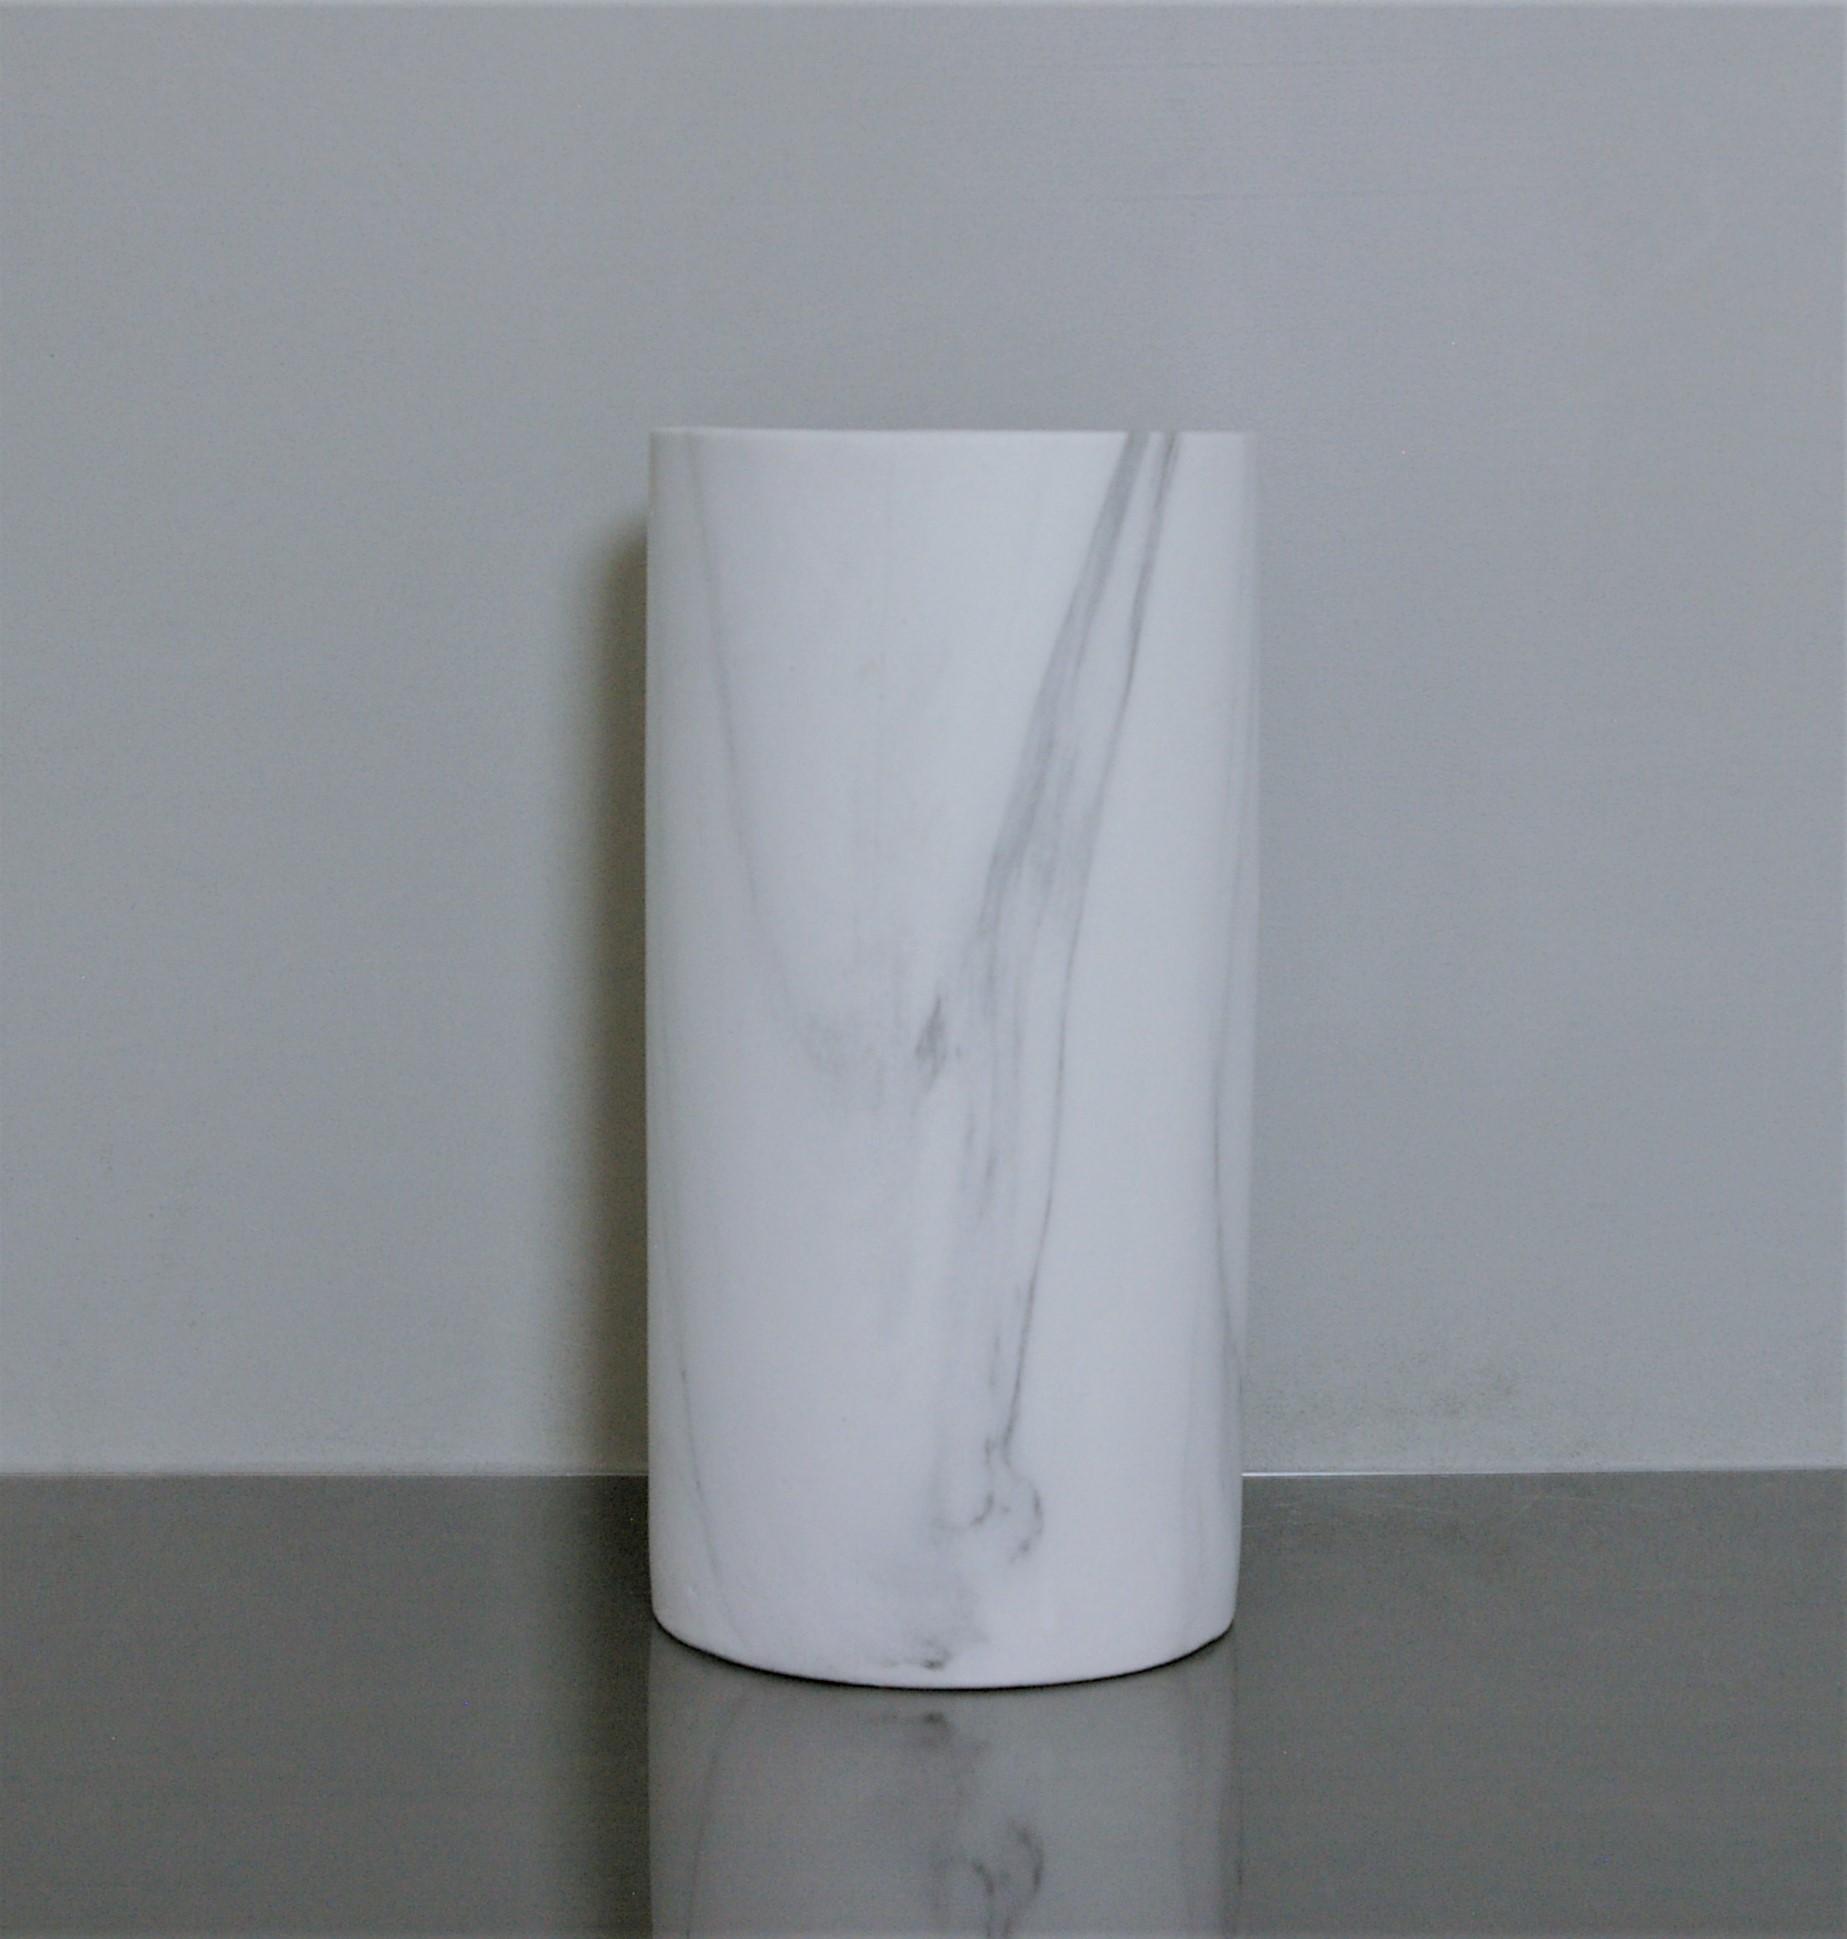 Cr Mb510 Ceramic Marble Cylinder Vase 5 Quot X 10 Quot White 6 P